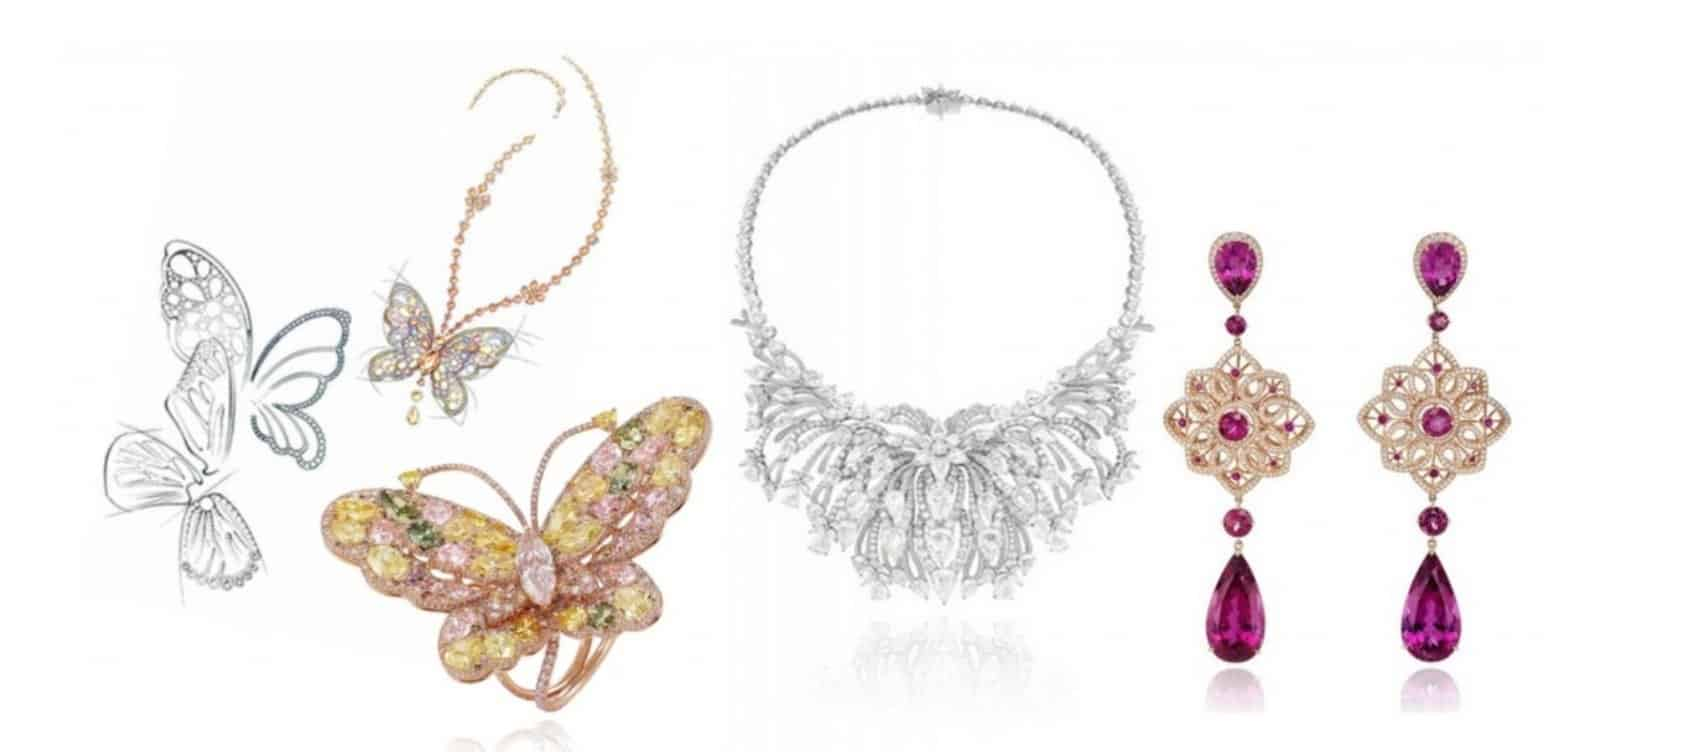 Best Fake Designer Jewelry Luxury Jewellery Copy Valentine Anniversary Cheap DhGate